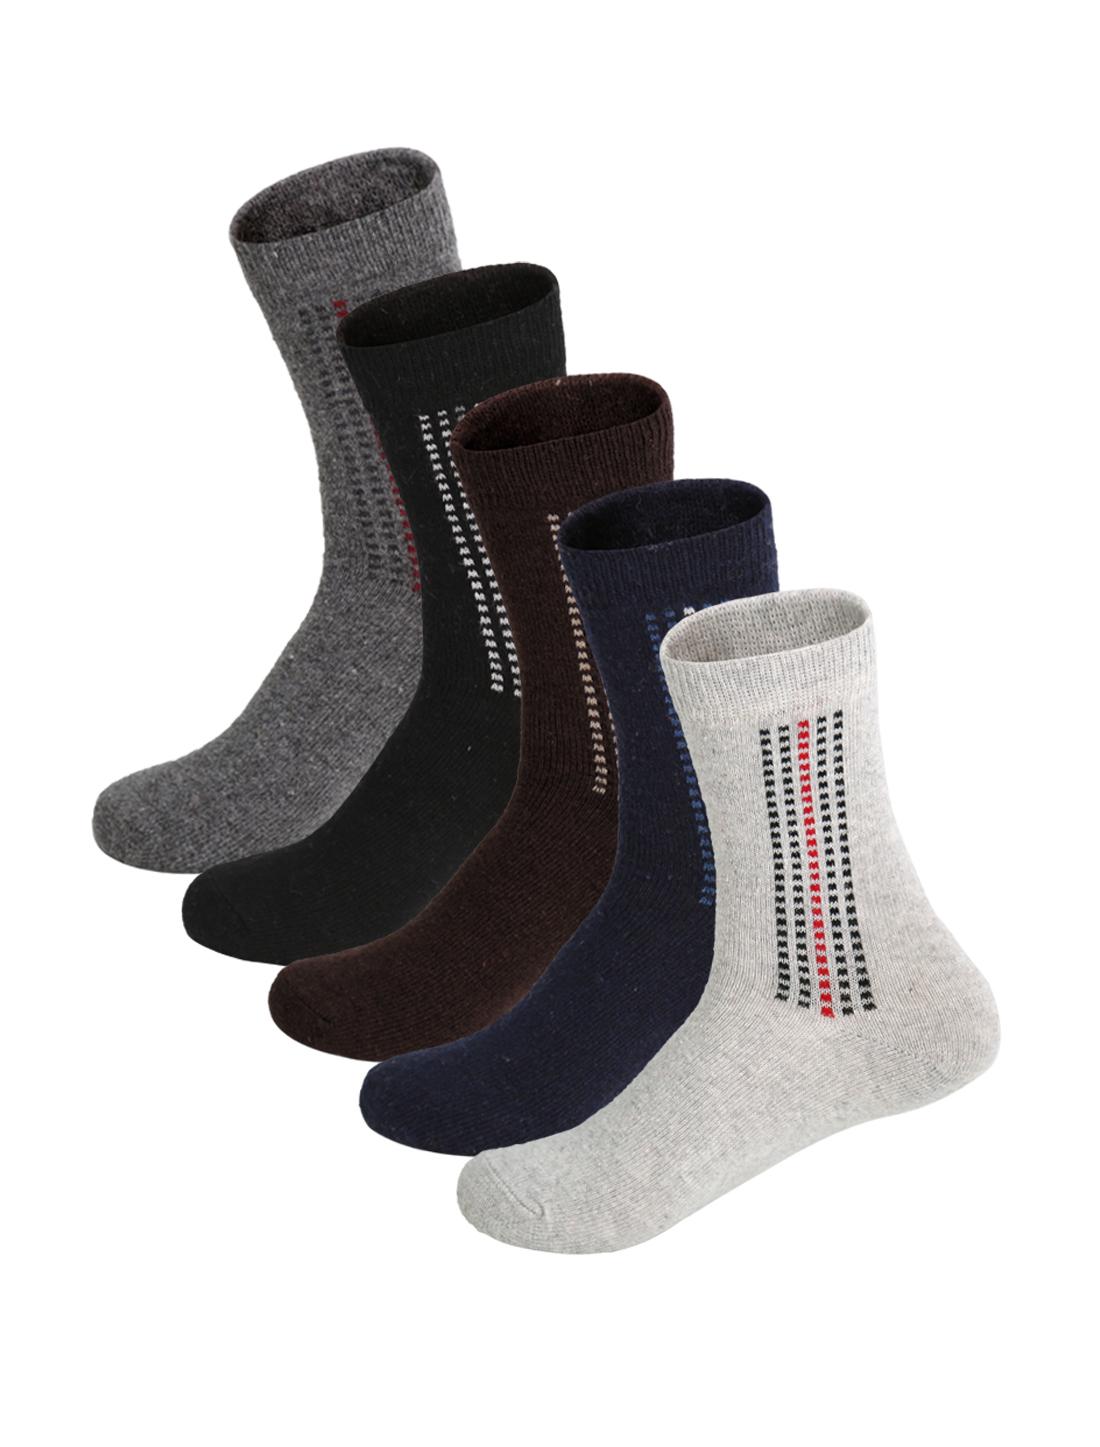 Men 5 Pack Plaids Pattern Half Cushion Basic Crew Socks Assorted 10-12